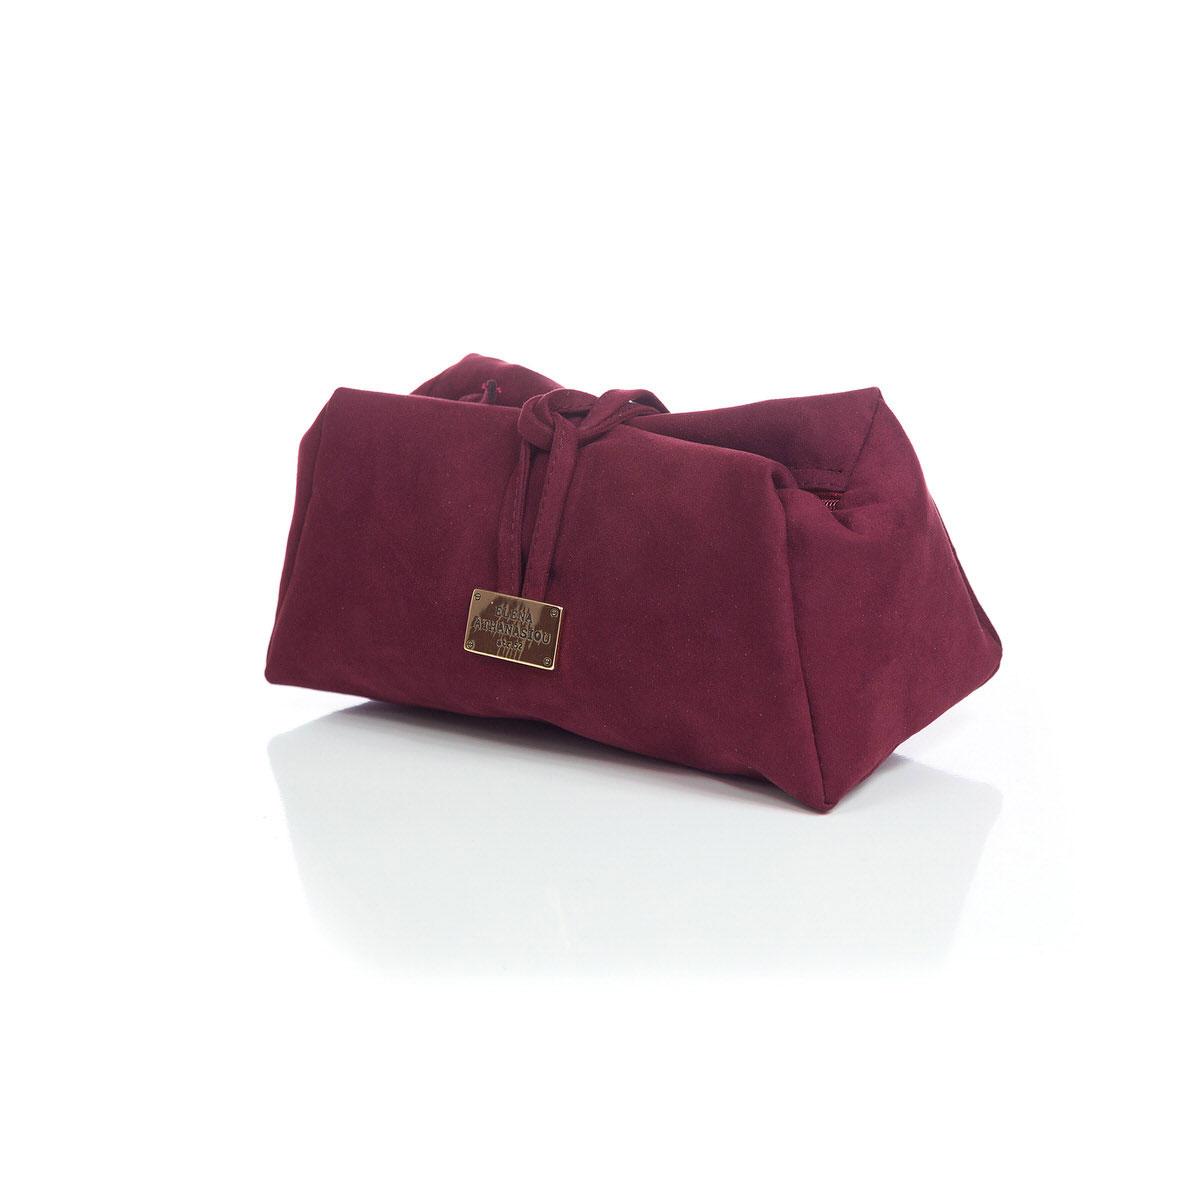 Lunchbag Suede Burgundy